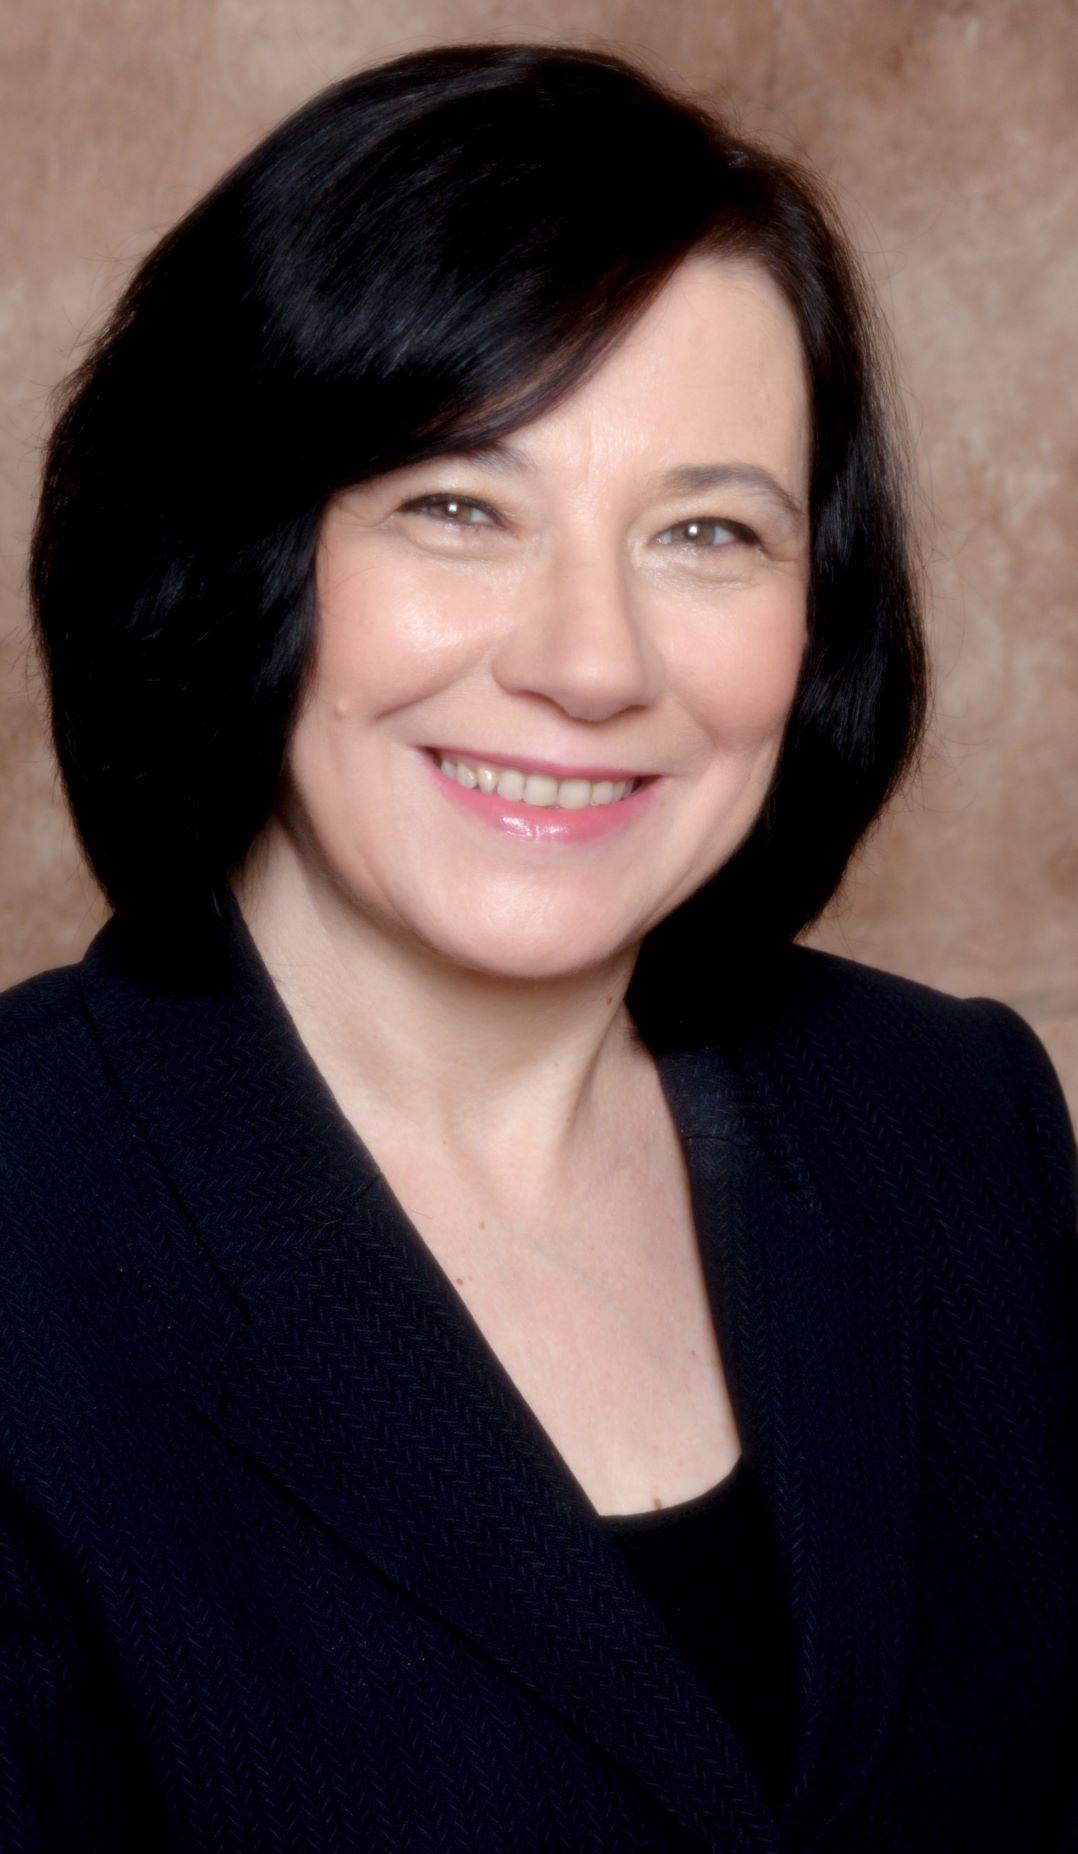 Gladys Groff-Fonseca